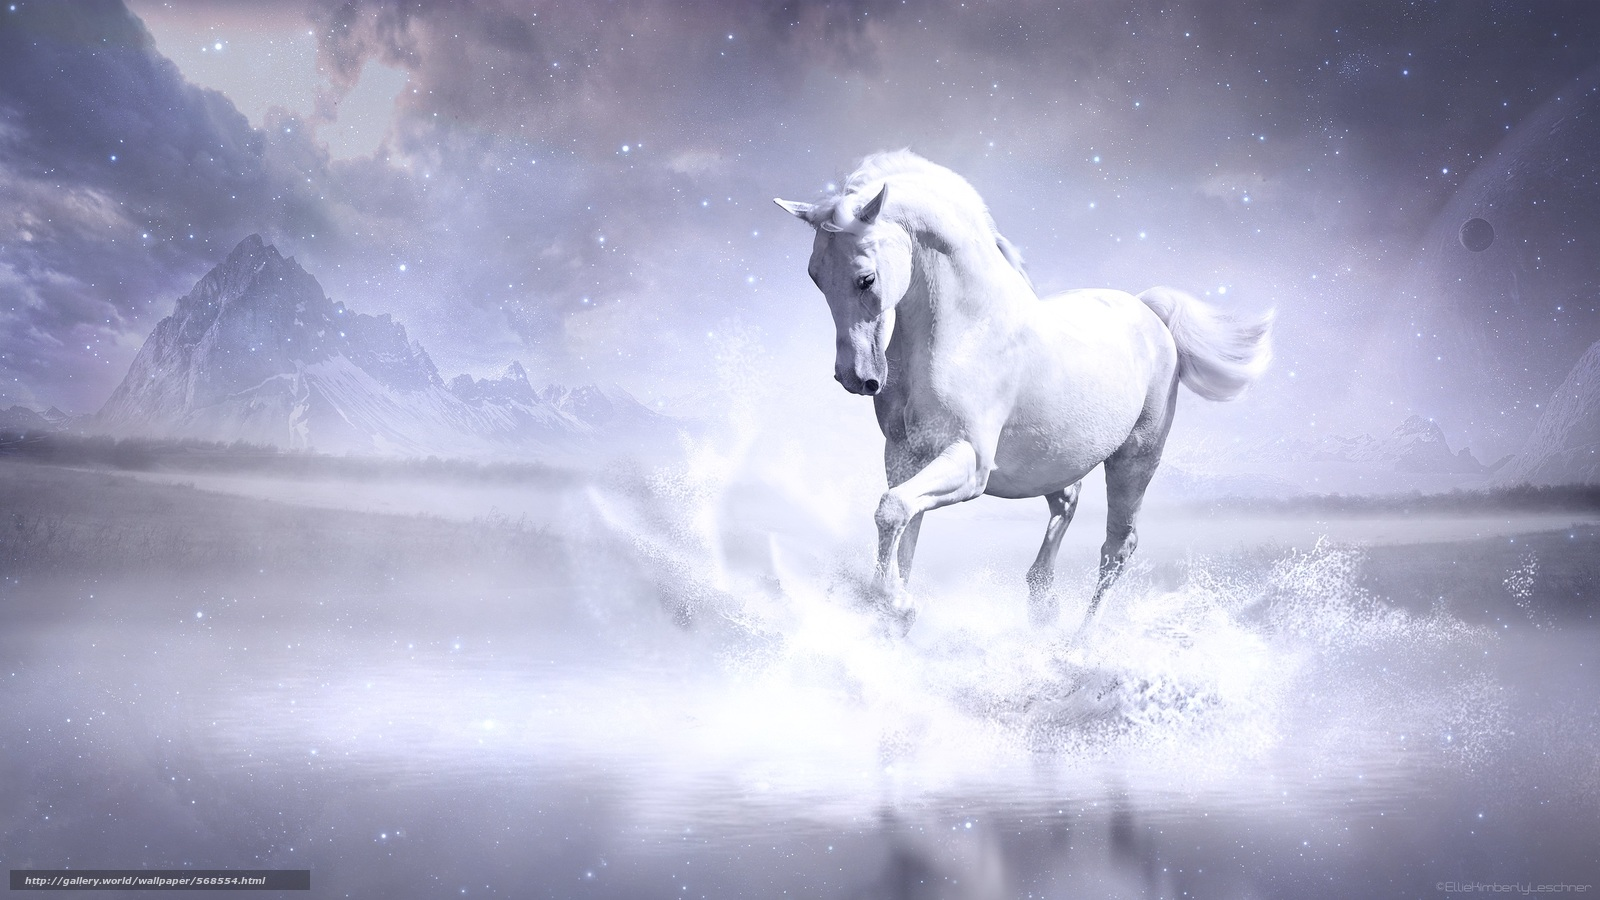 Download Wallpaper Horse Horse 3d Free Desktop Wallpaper In The